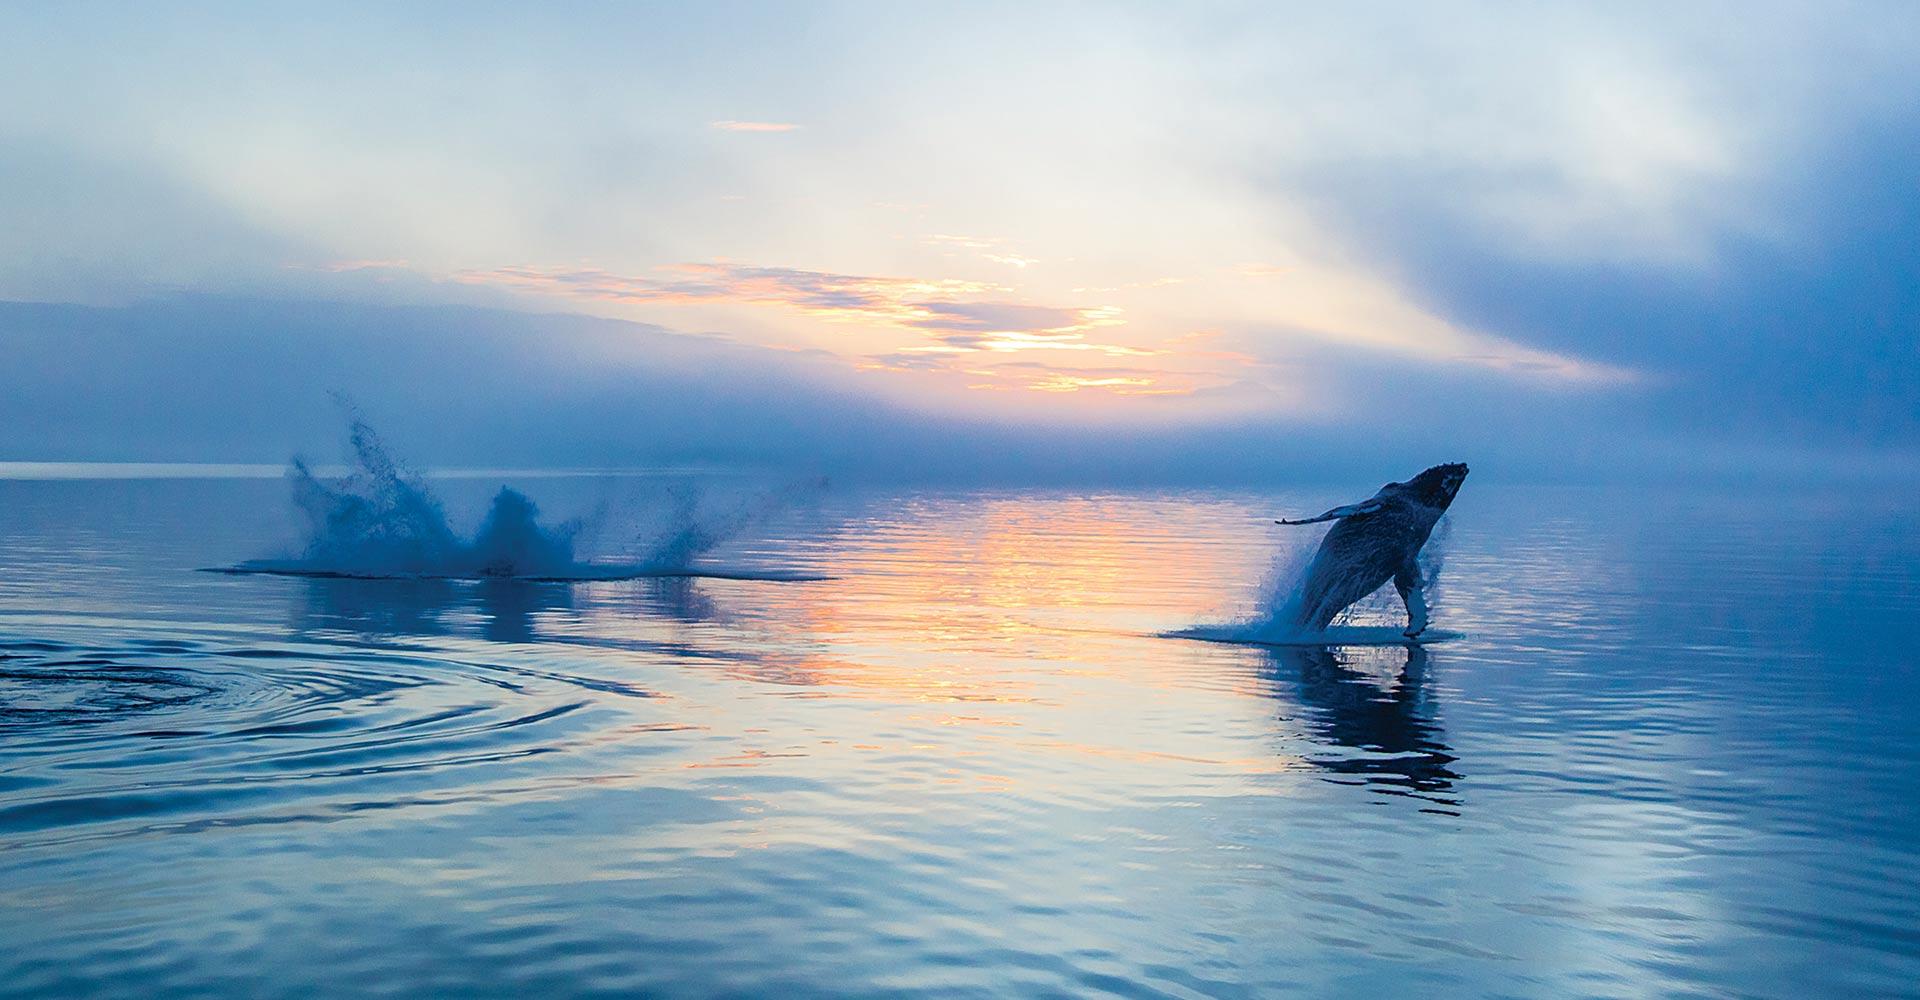 Whale breaching at sunrise